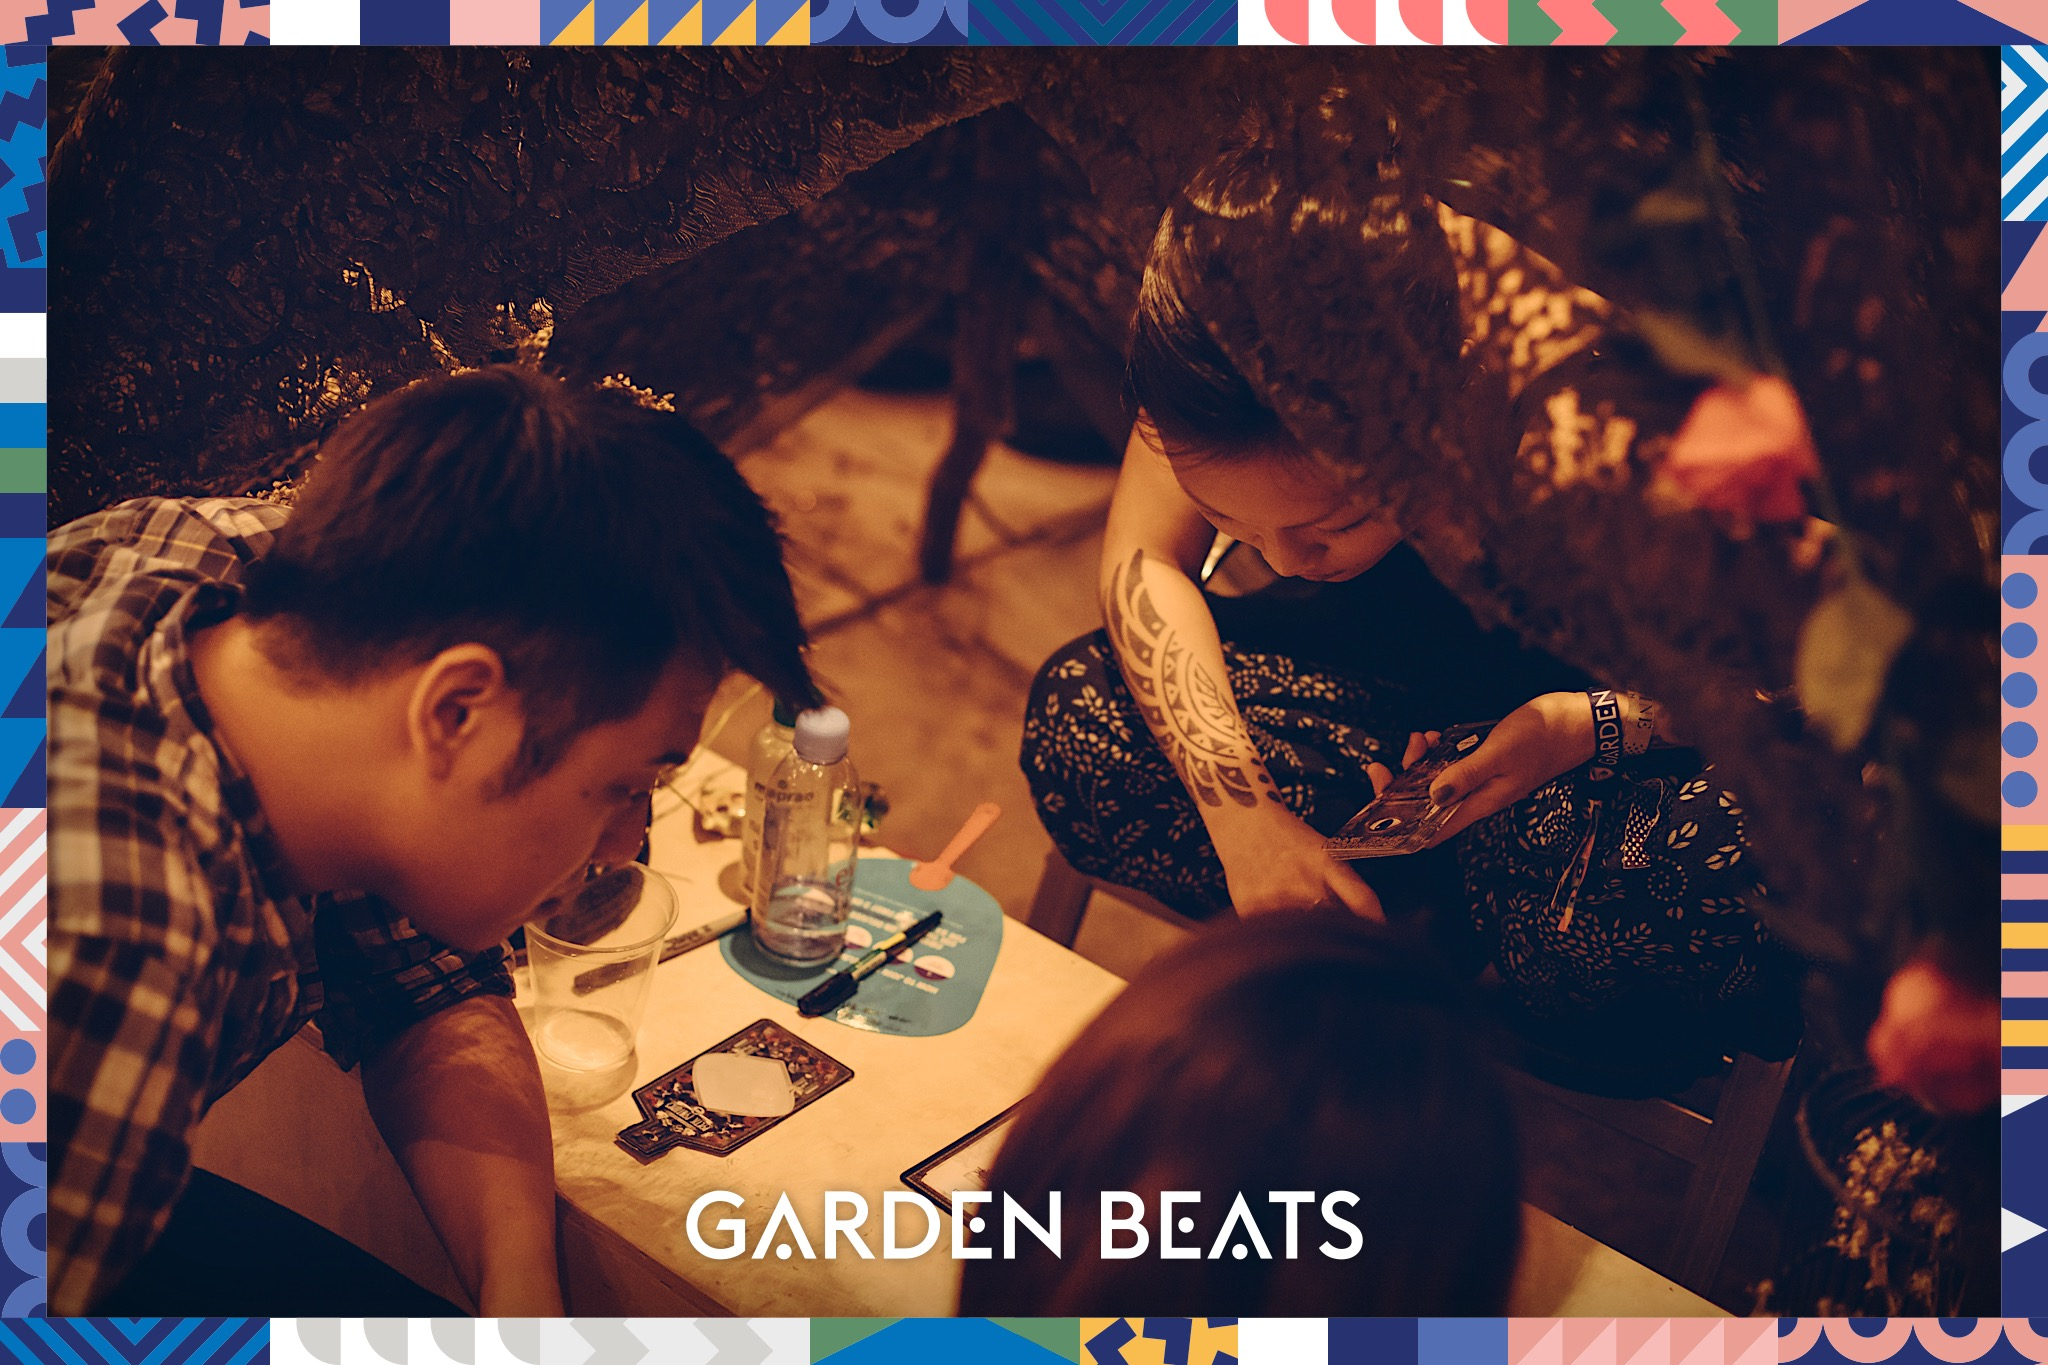 03032018_GardenBeats_Colossal893_Watermarked.jpg